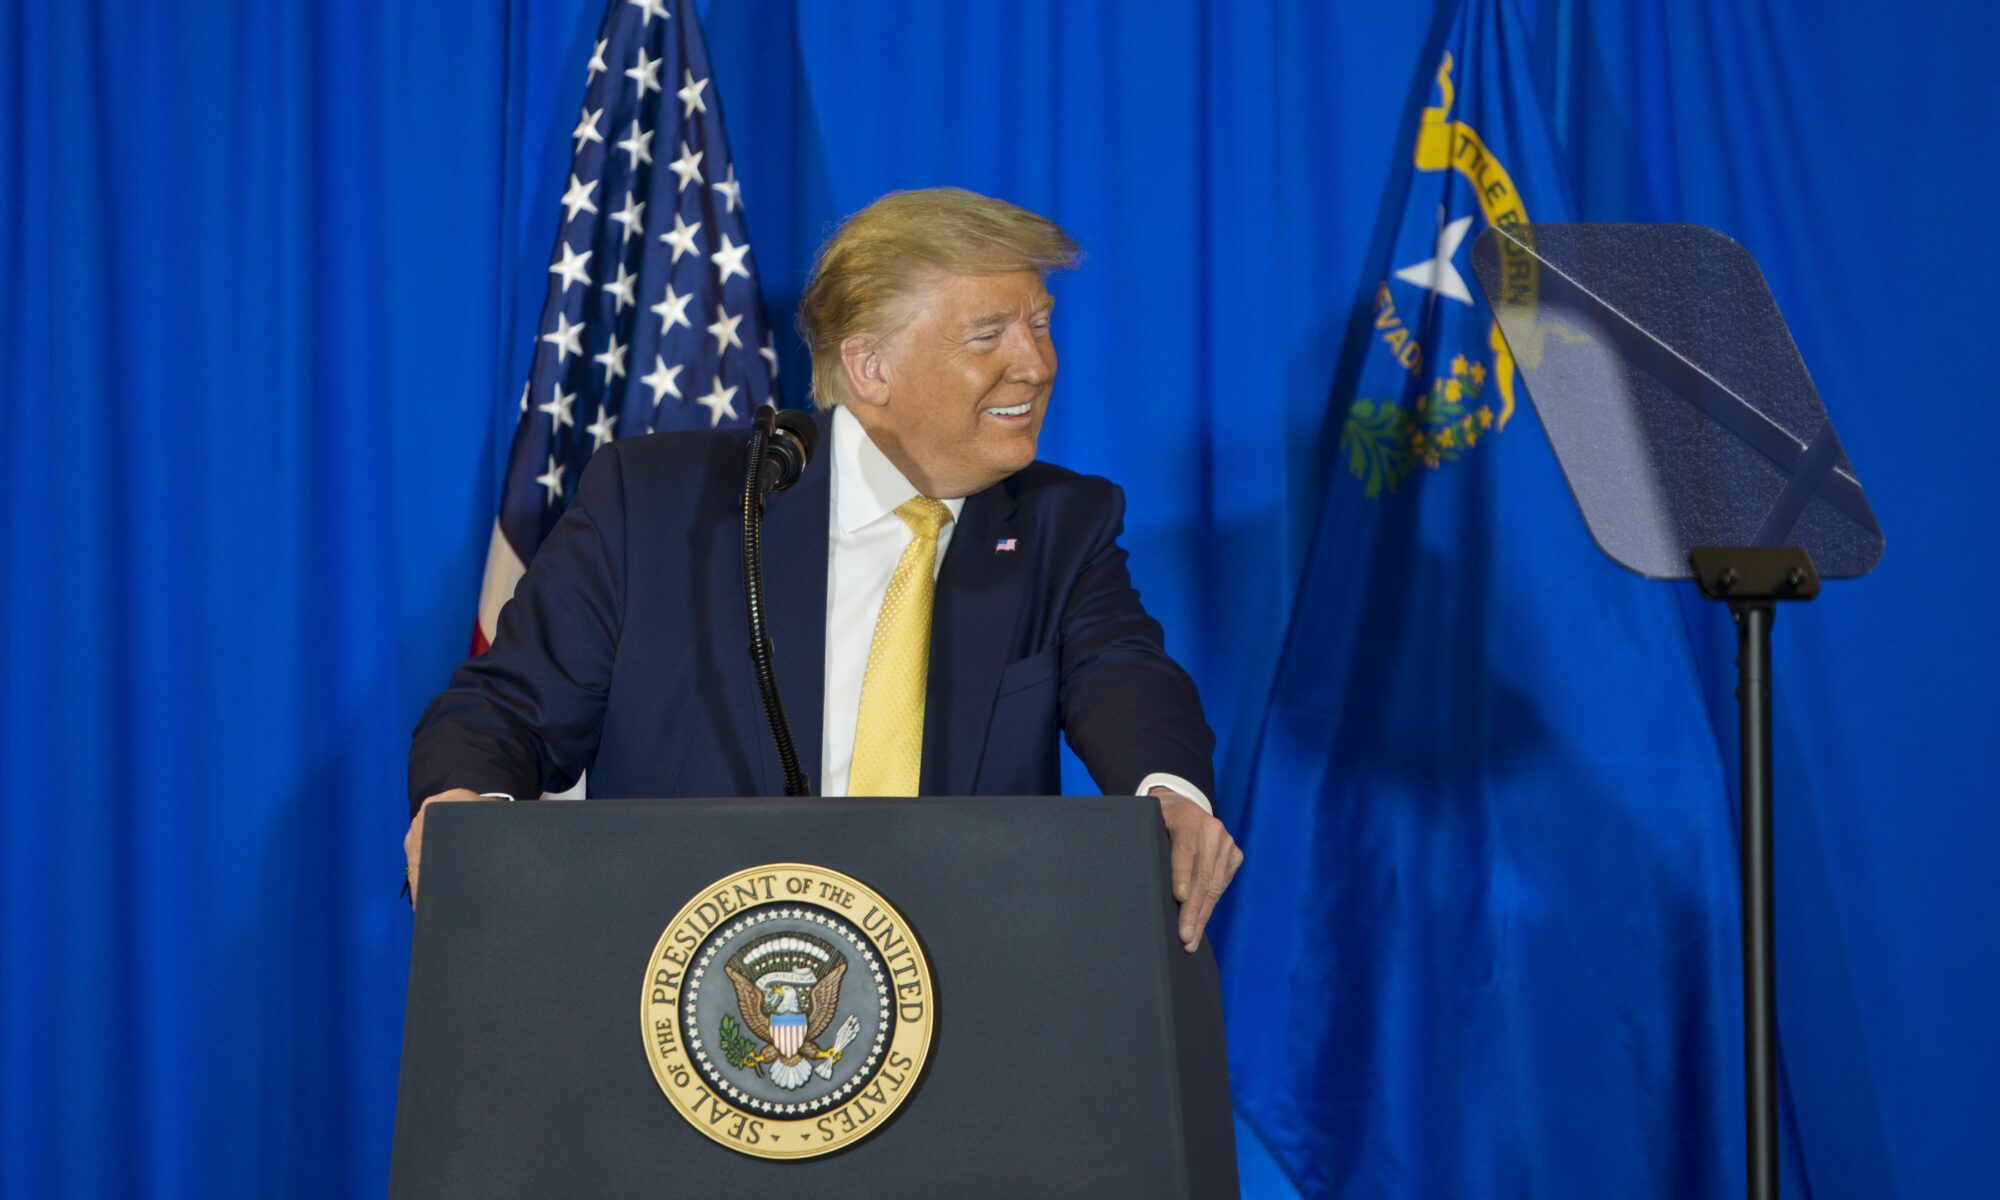 President Donald Trump speaks during a Hope For Prisoners special graduation ceremony at the Las Vegas Metropolitan Police Department headquarters in Las Vegas